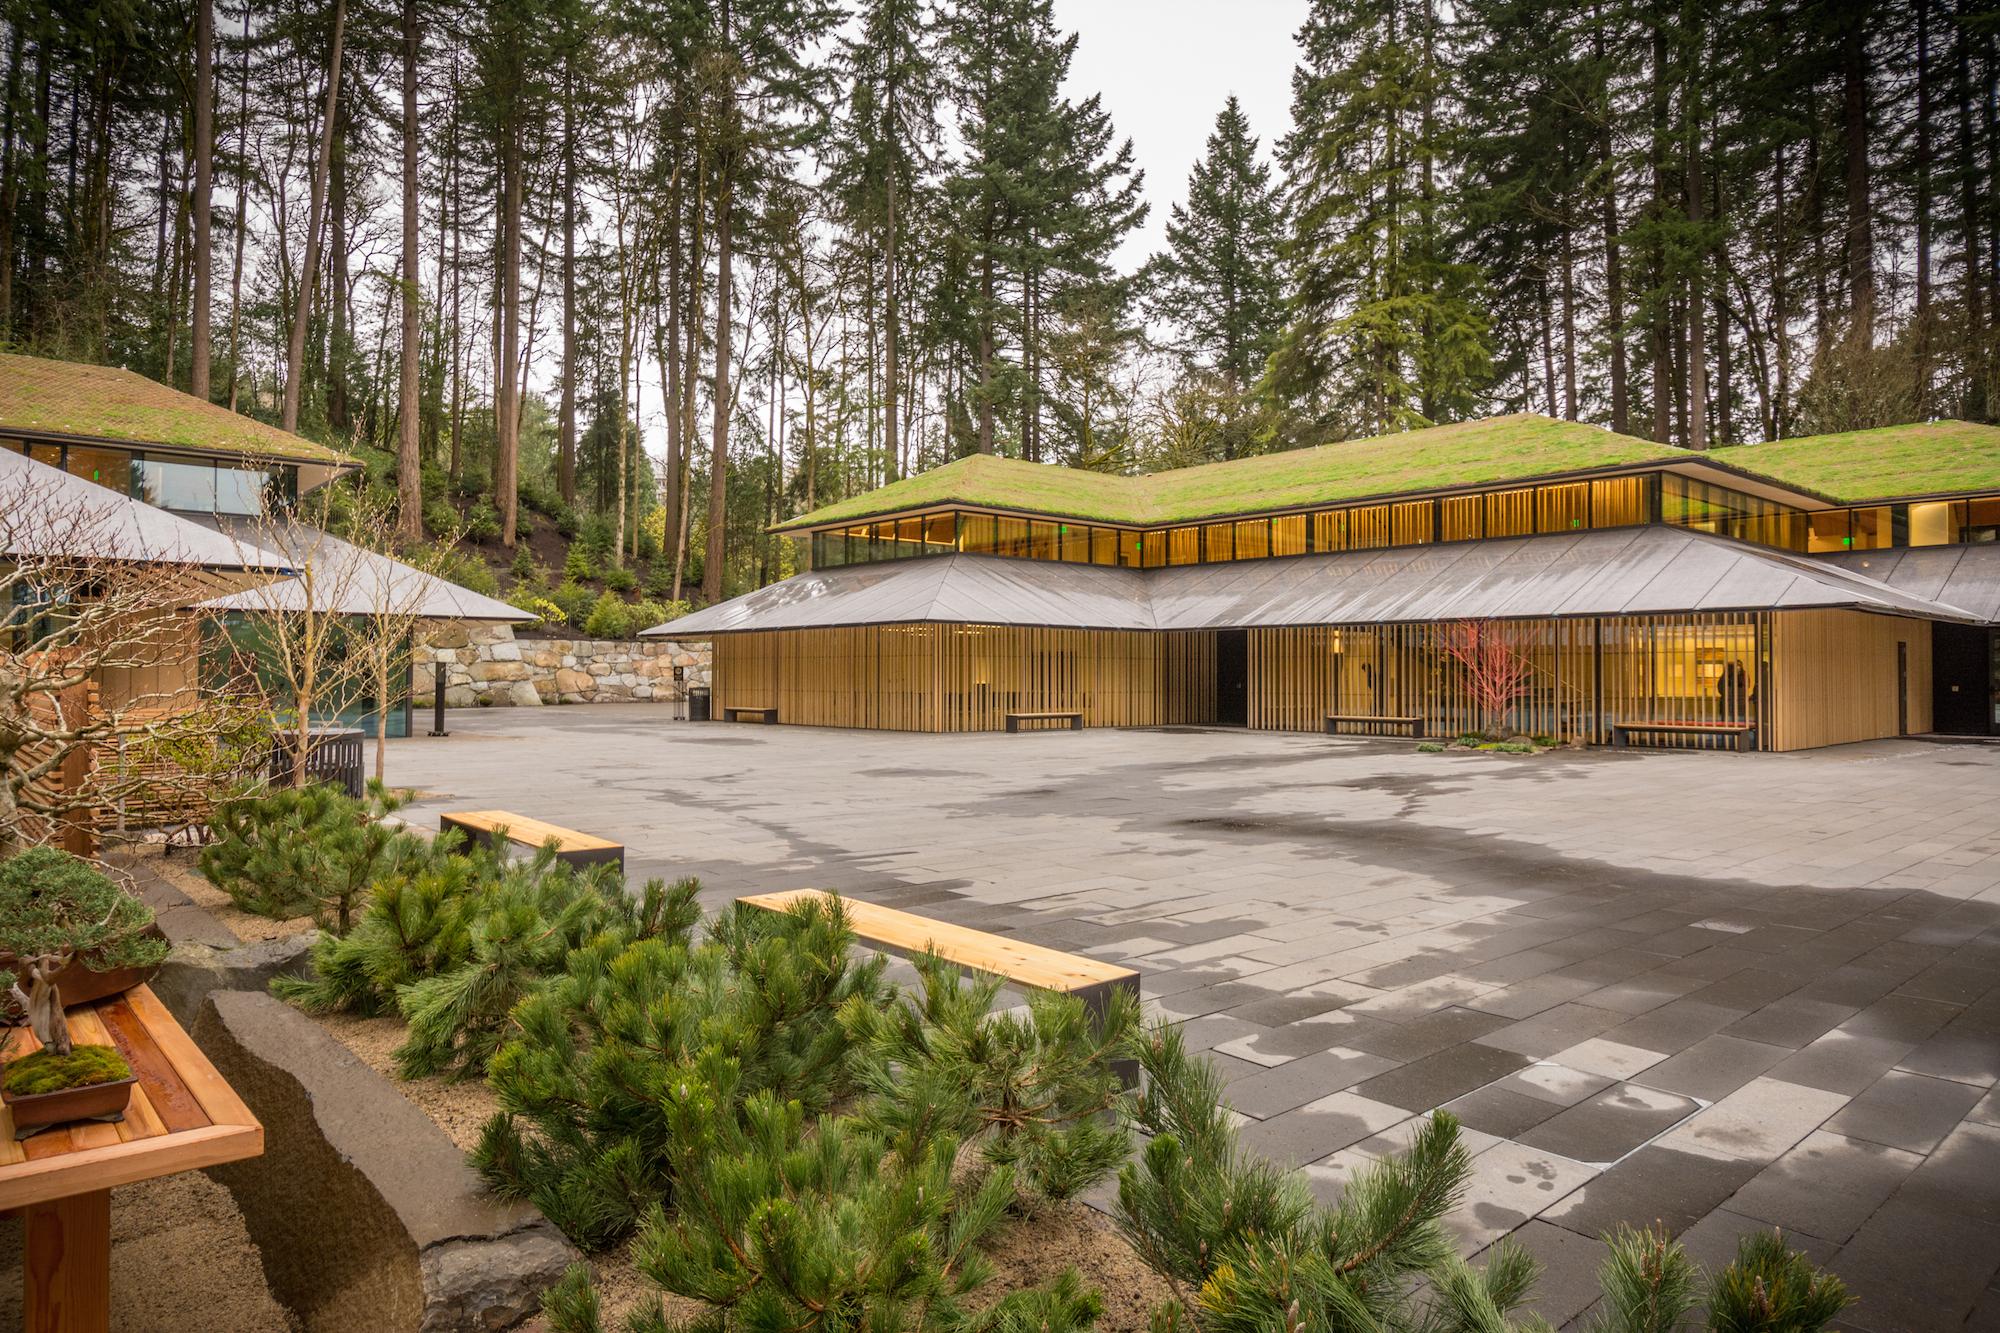 portland japanese garden s kengo kuma designed expansion is now